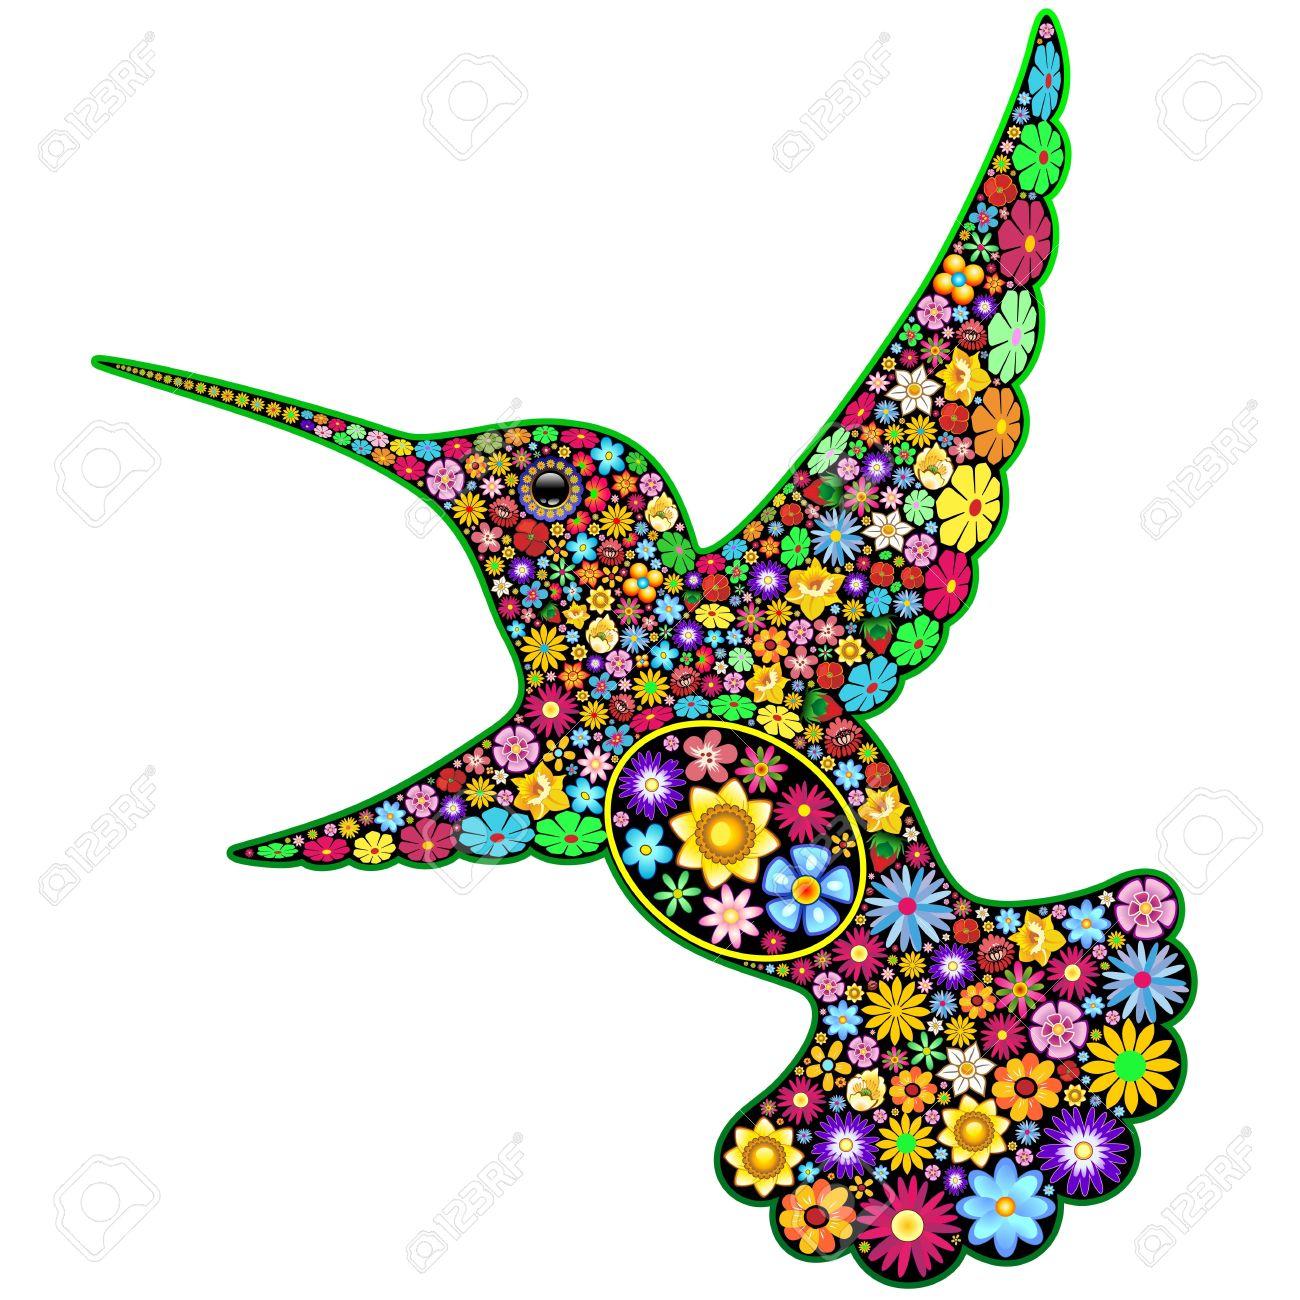 Hummingbird Floral Ornamental Art Design Stock Vector - 19317038